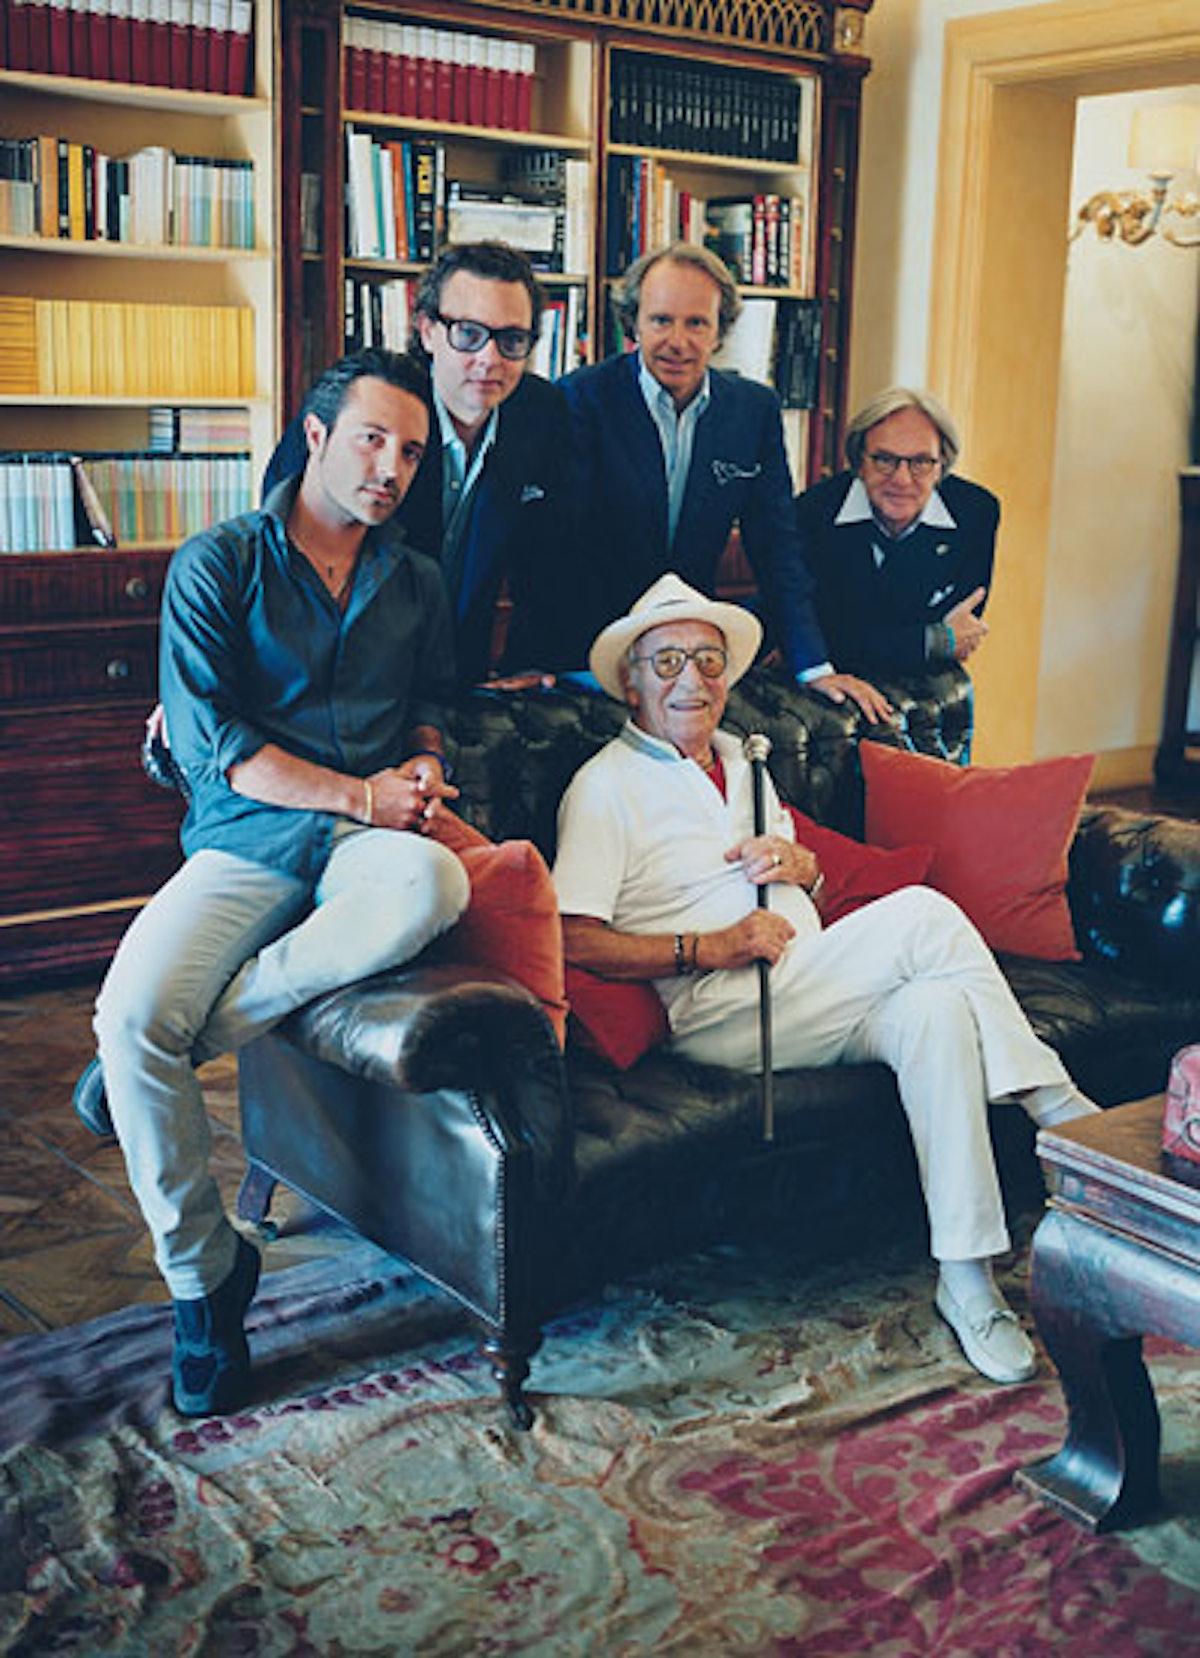 cess-fashionable-fathers-03-v.jpg